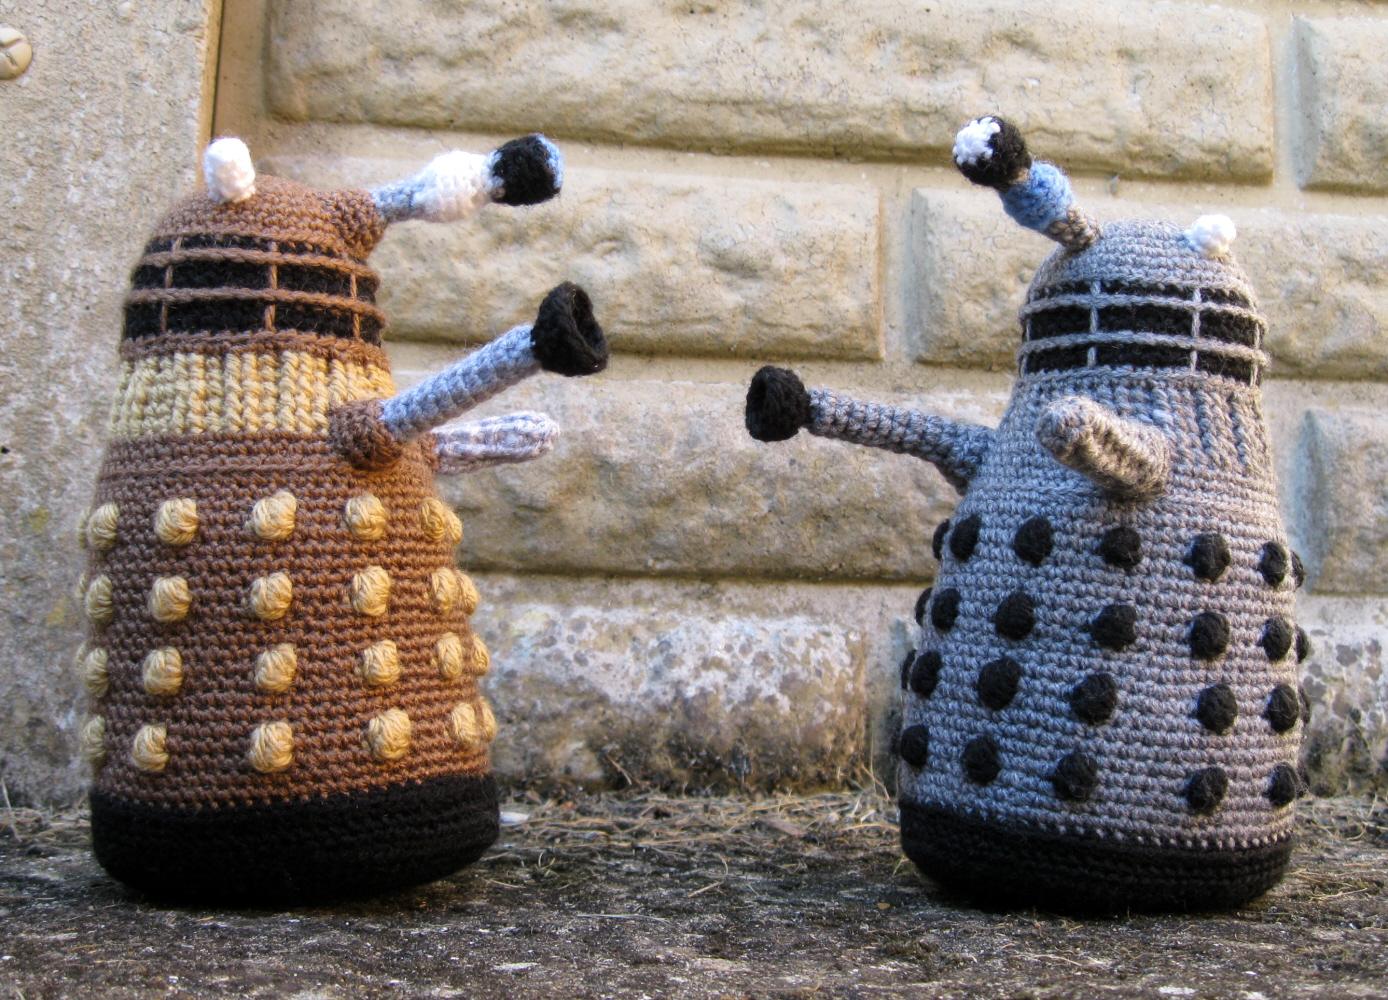 Free Baby Blanket Knitting Patterns Chunky Yarn : LucyRavenscar - Crochet Creatures: Dalek Amigurumi Pattern - Free!